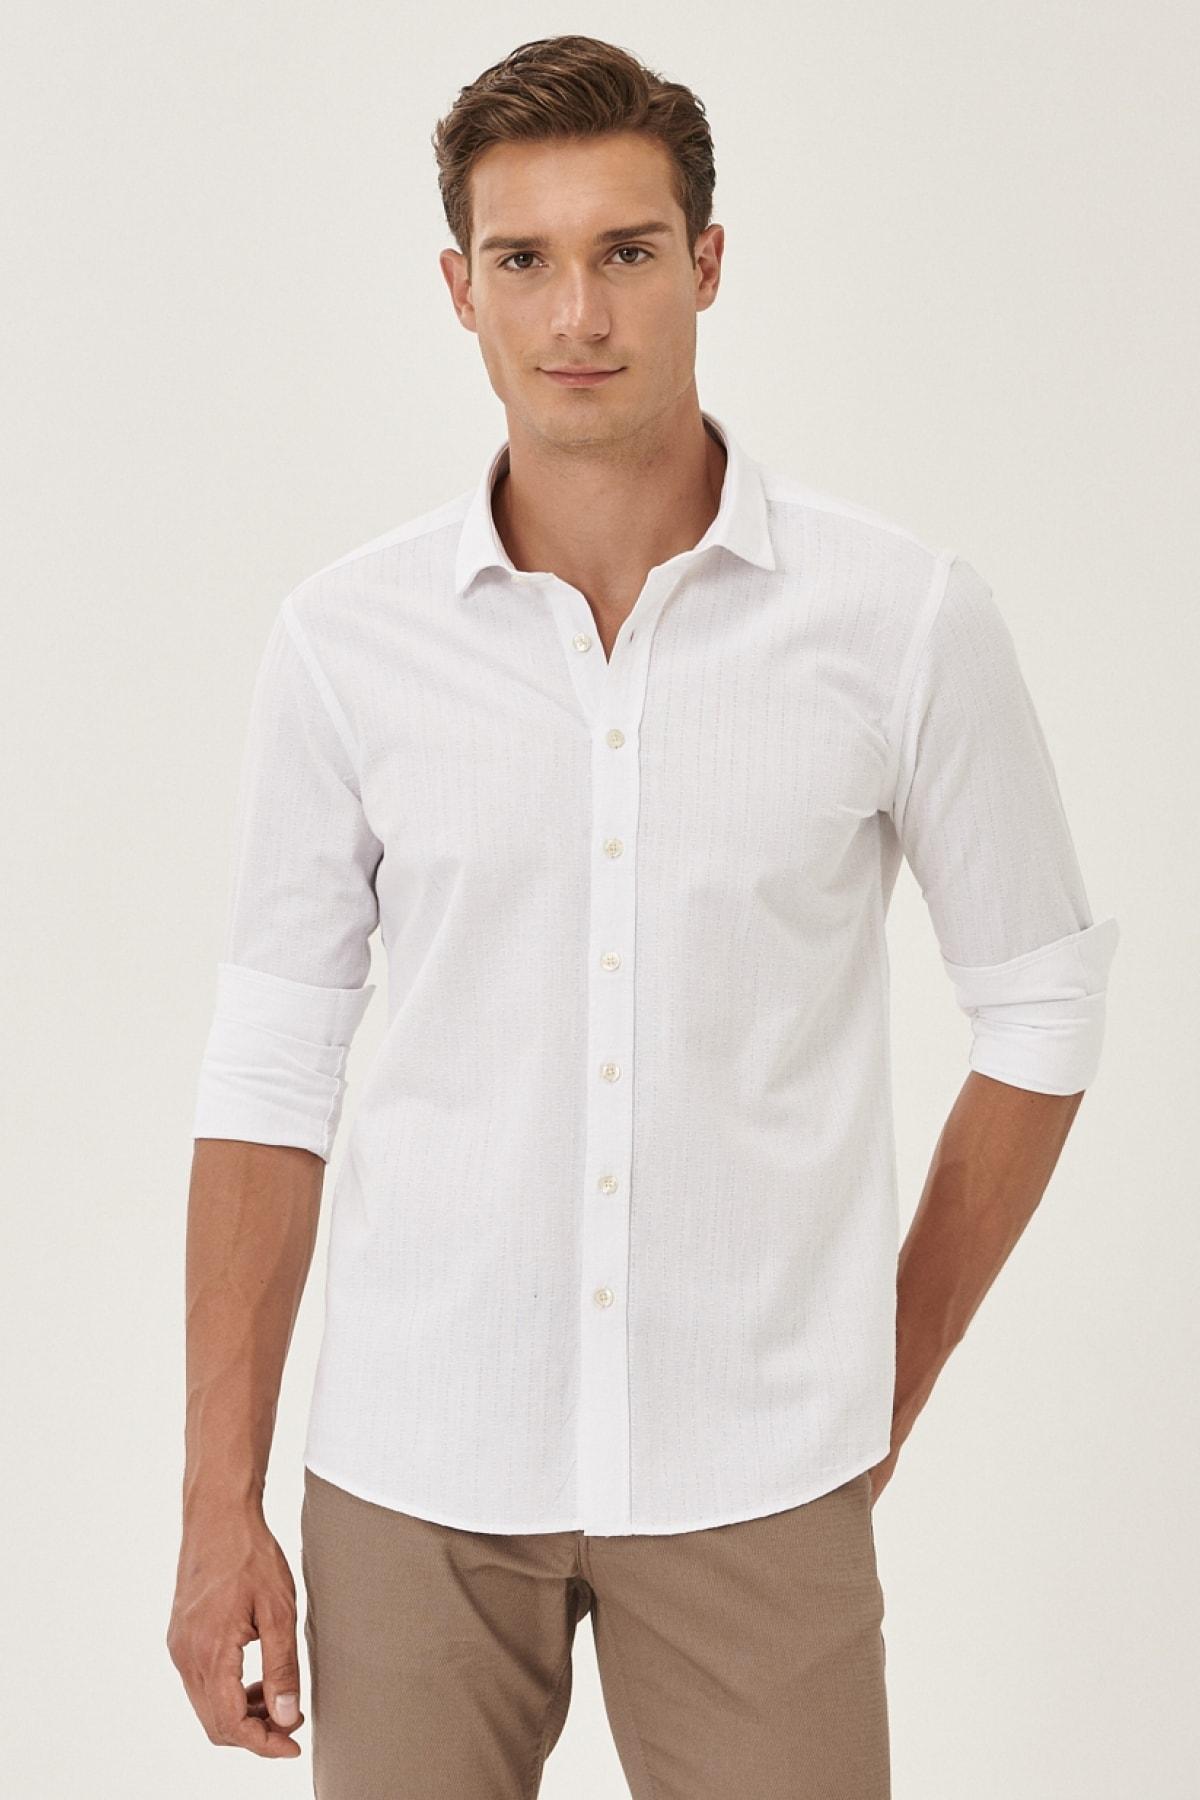 Erkek Beyaz Tailored Slim Fit Klasik Gömlek Yaka %100 Koton Gömlek